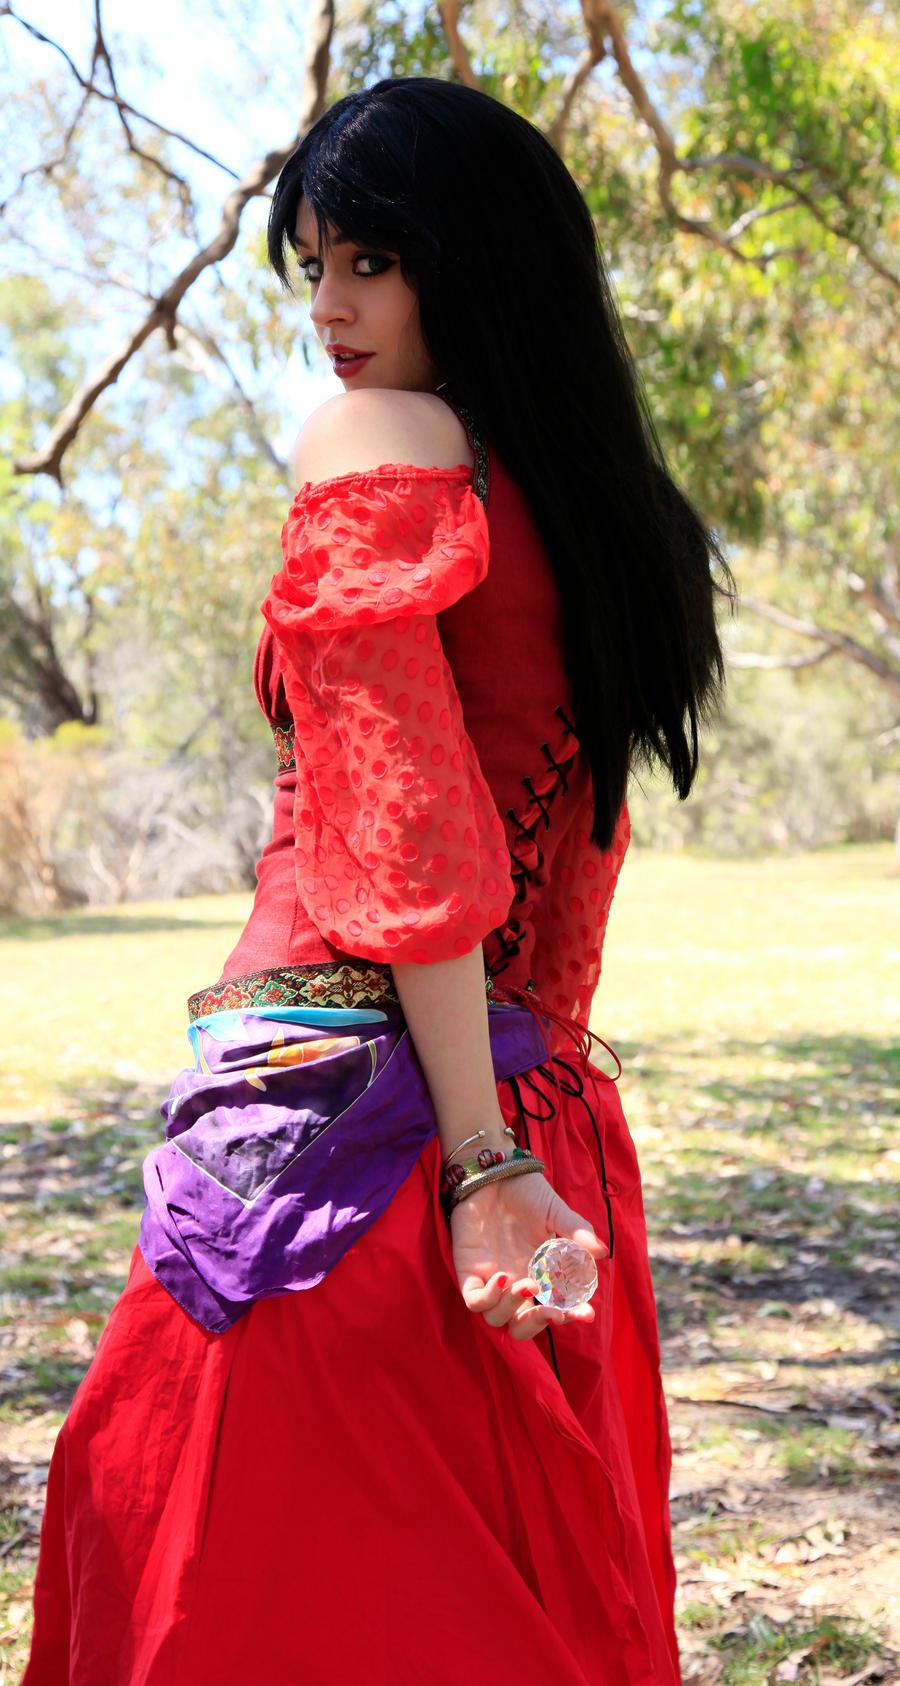 Gypsy Portrait8 by faestock